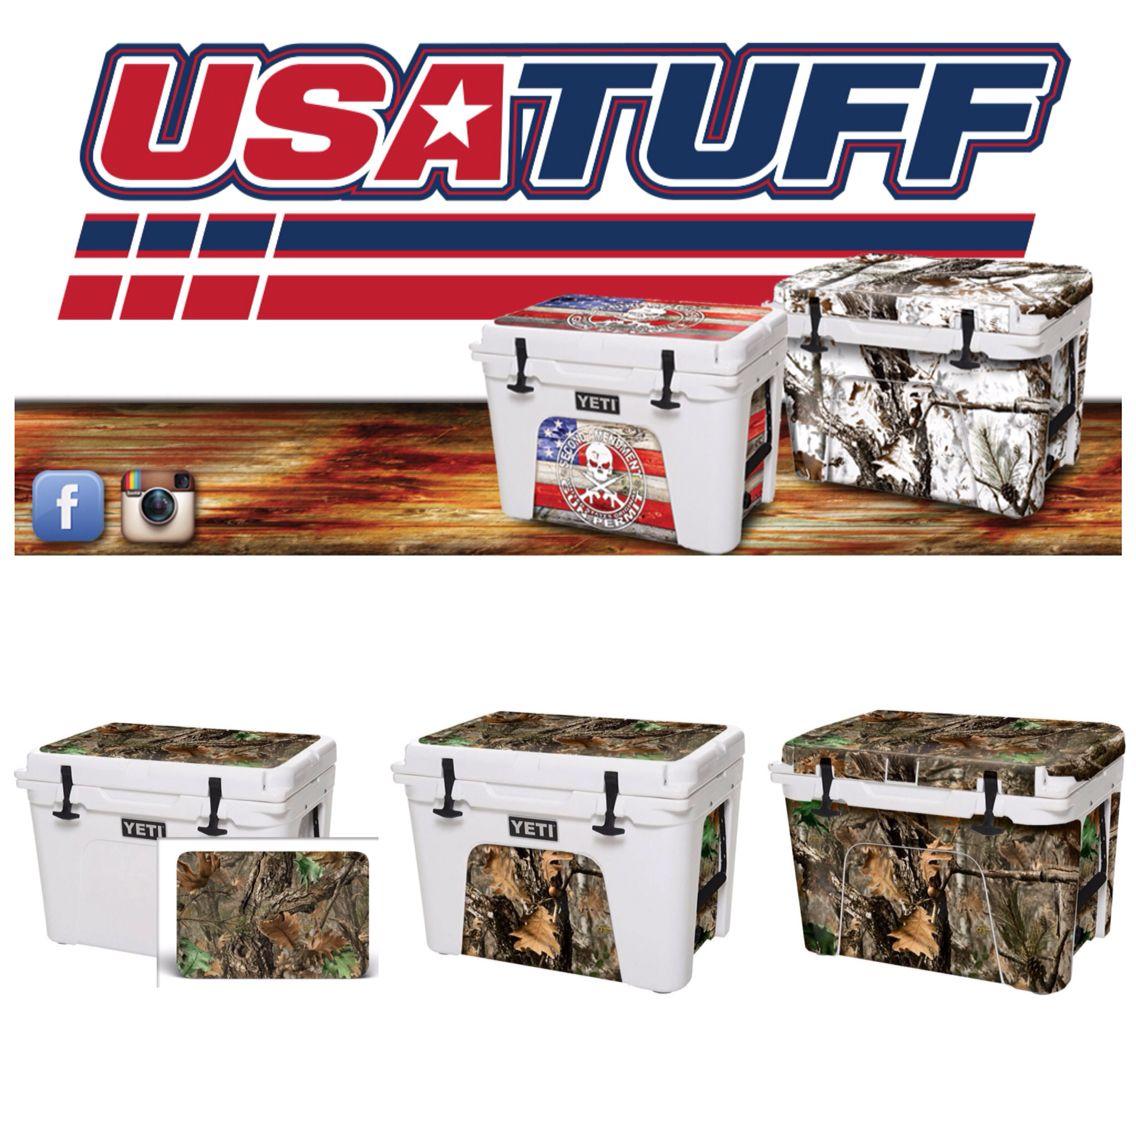 www usatuff com manufactures premium graphic skin wraps for